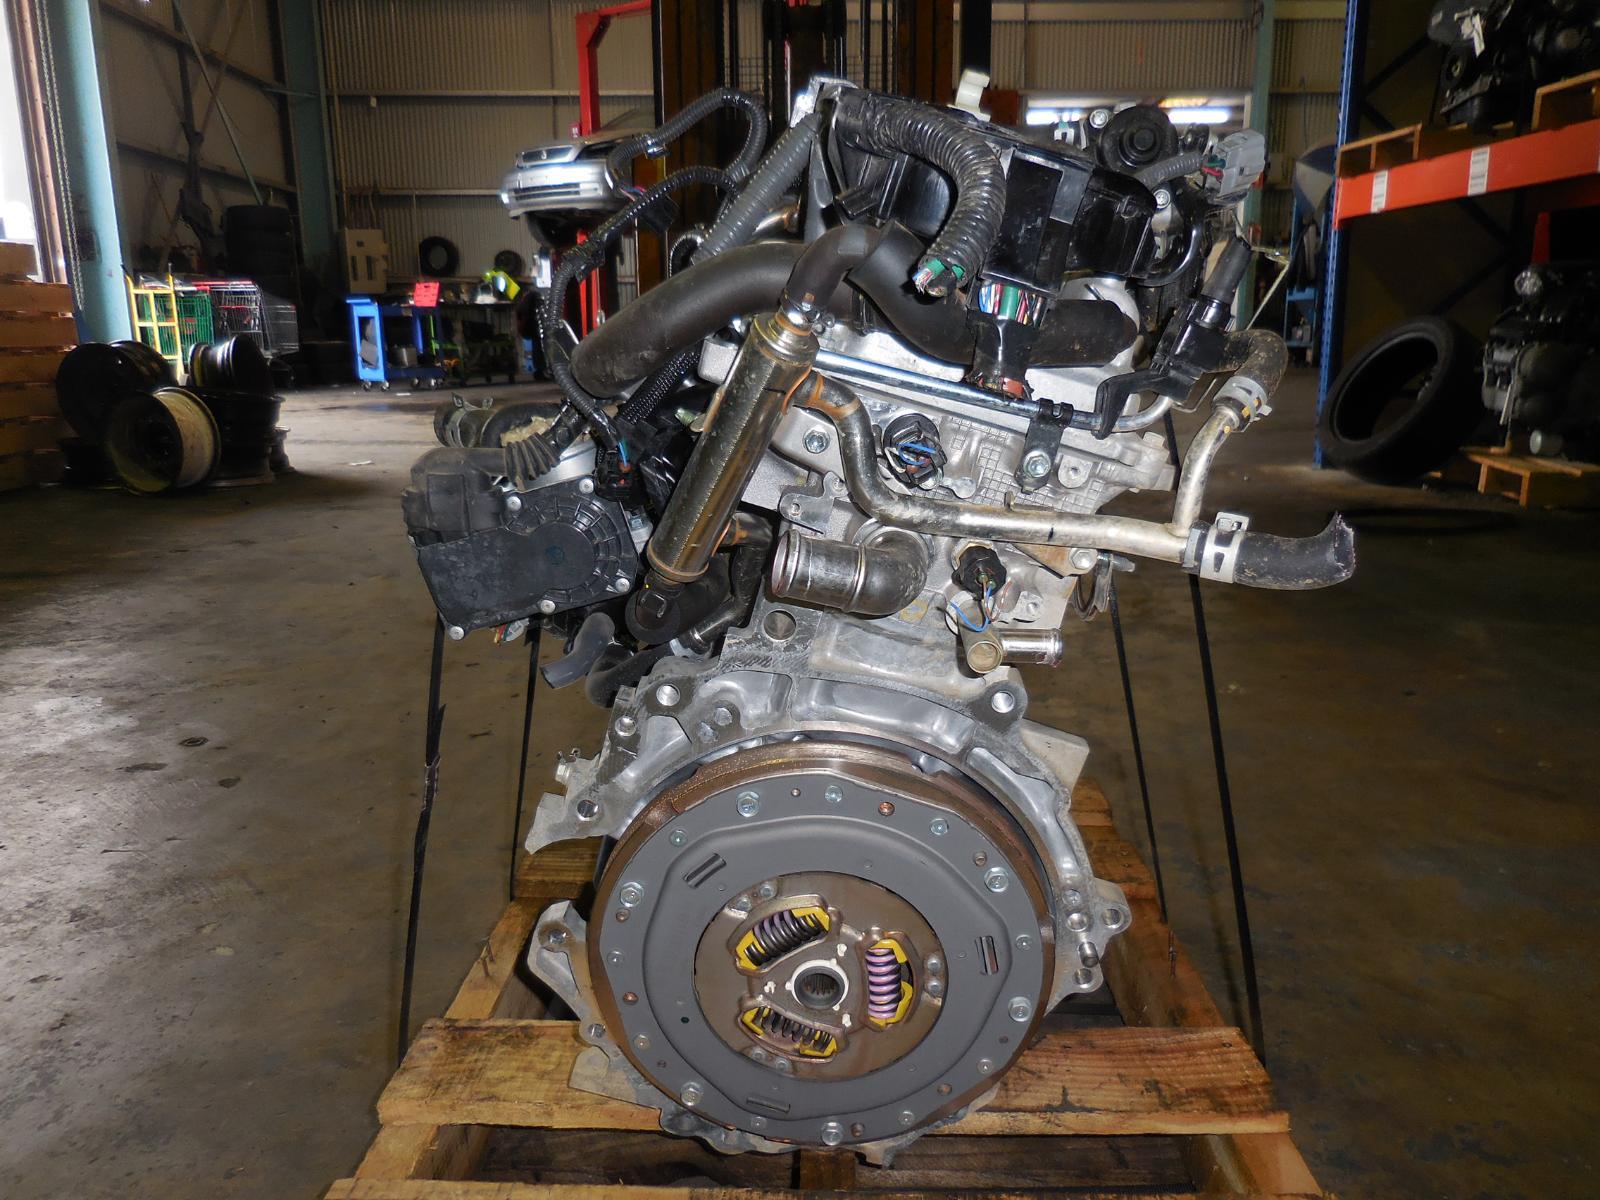 Toyota prius engine petrol 1 5 1nz fxe nhp10r 03 12 for Ebay motors toyota prius